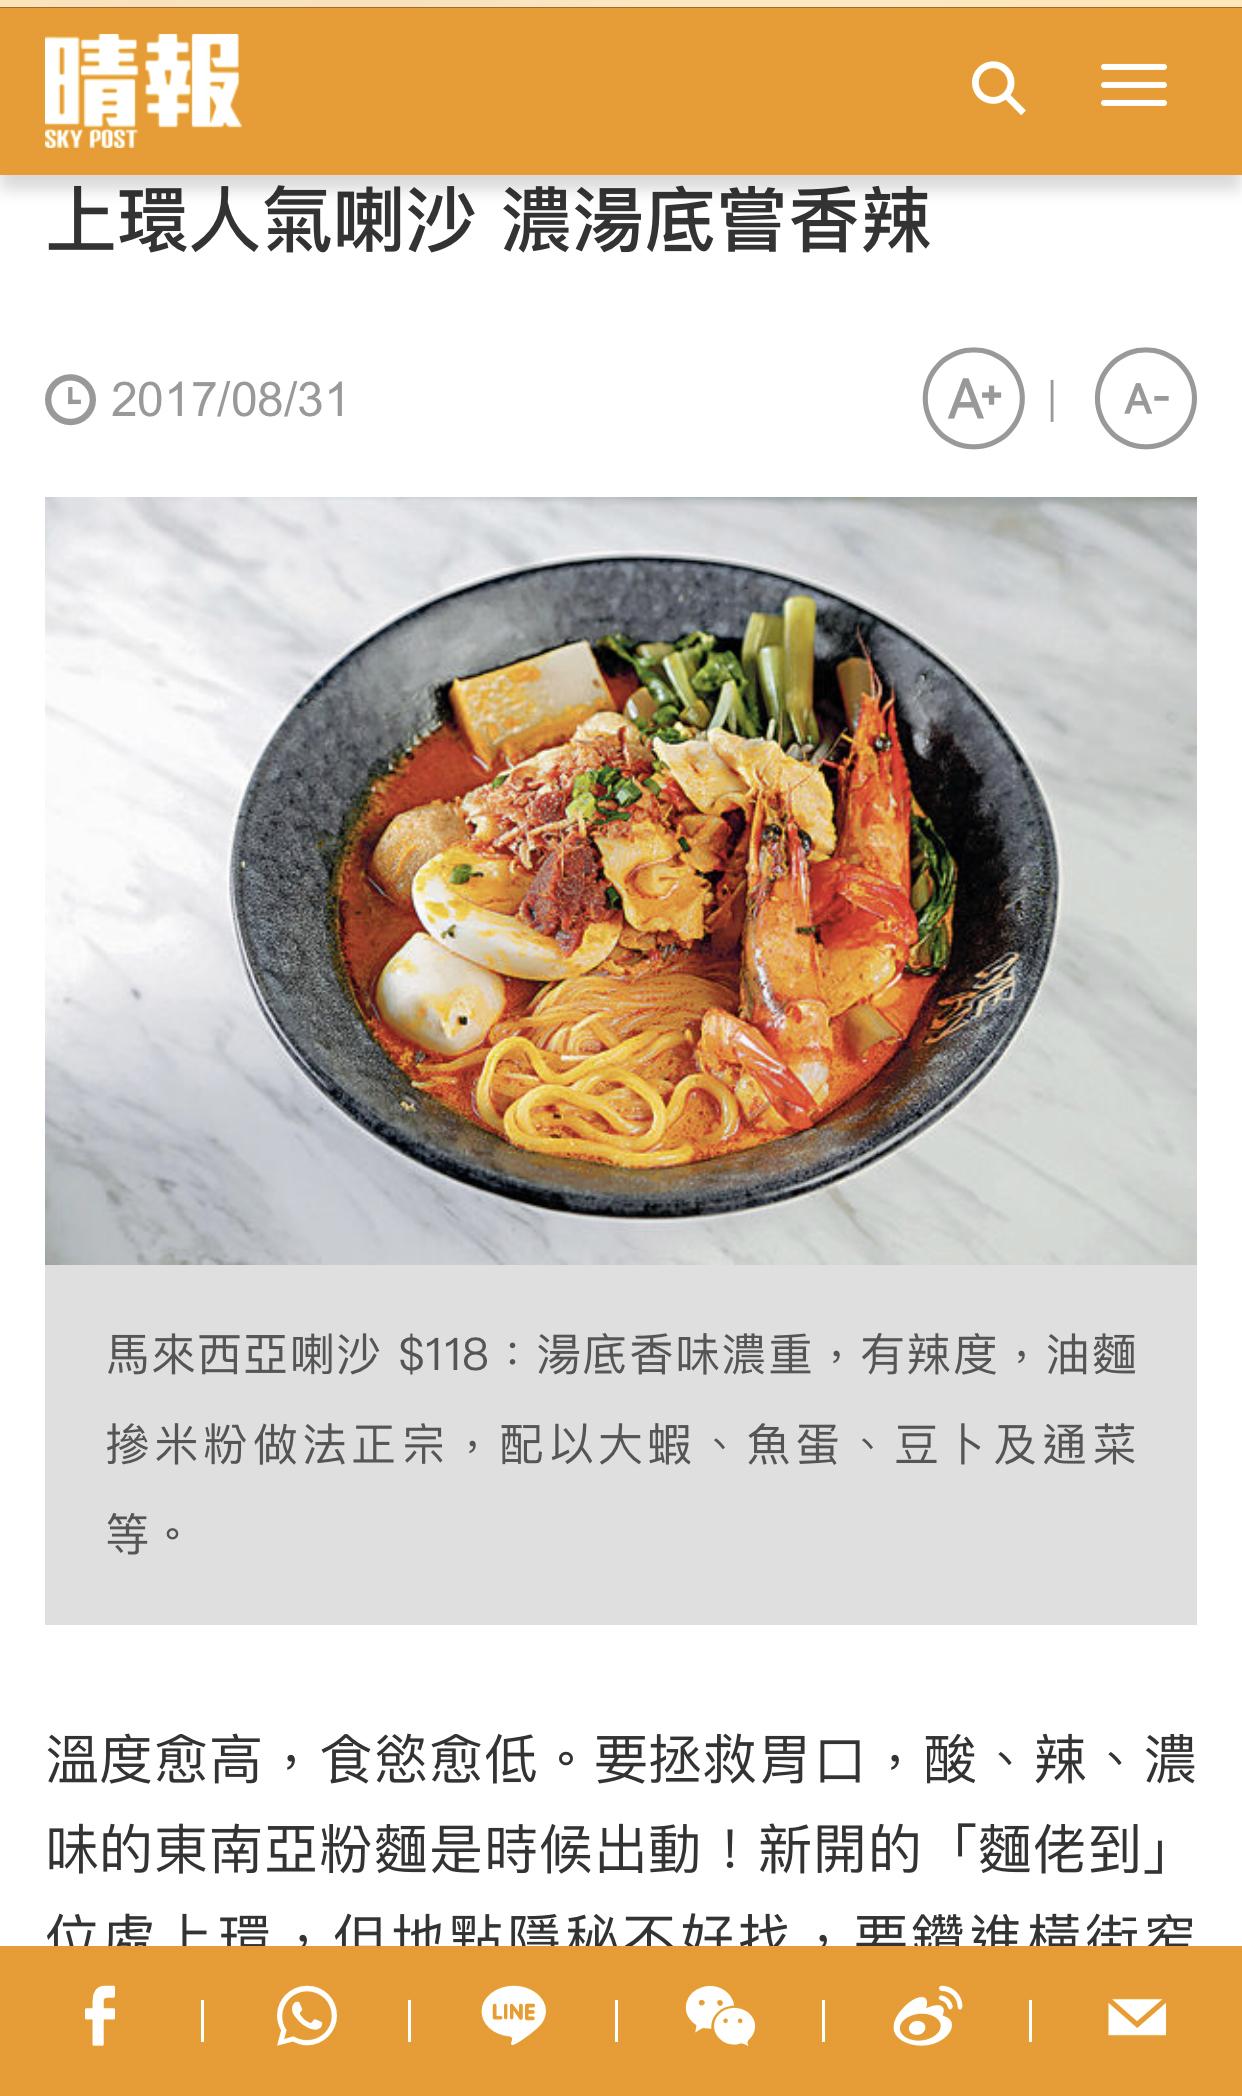 Mean Noodles on Sky Post 上環人氣喇沙 濃湯底嘗香辣